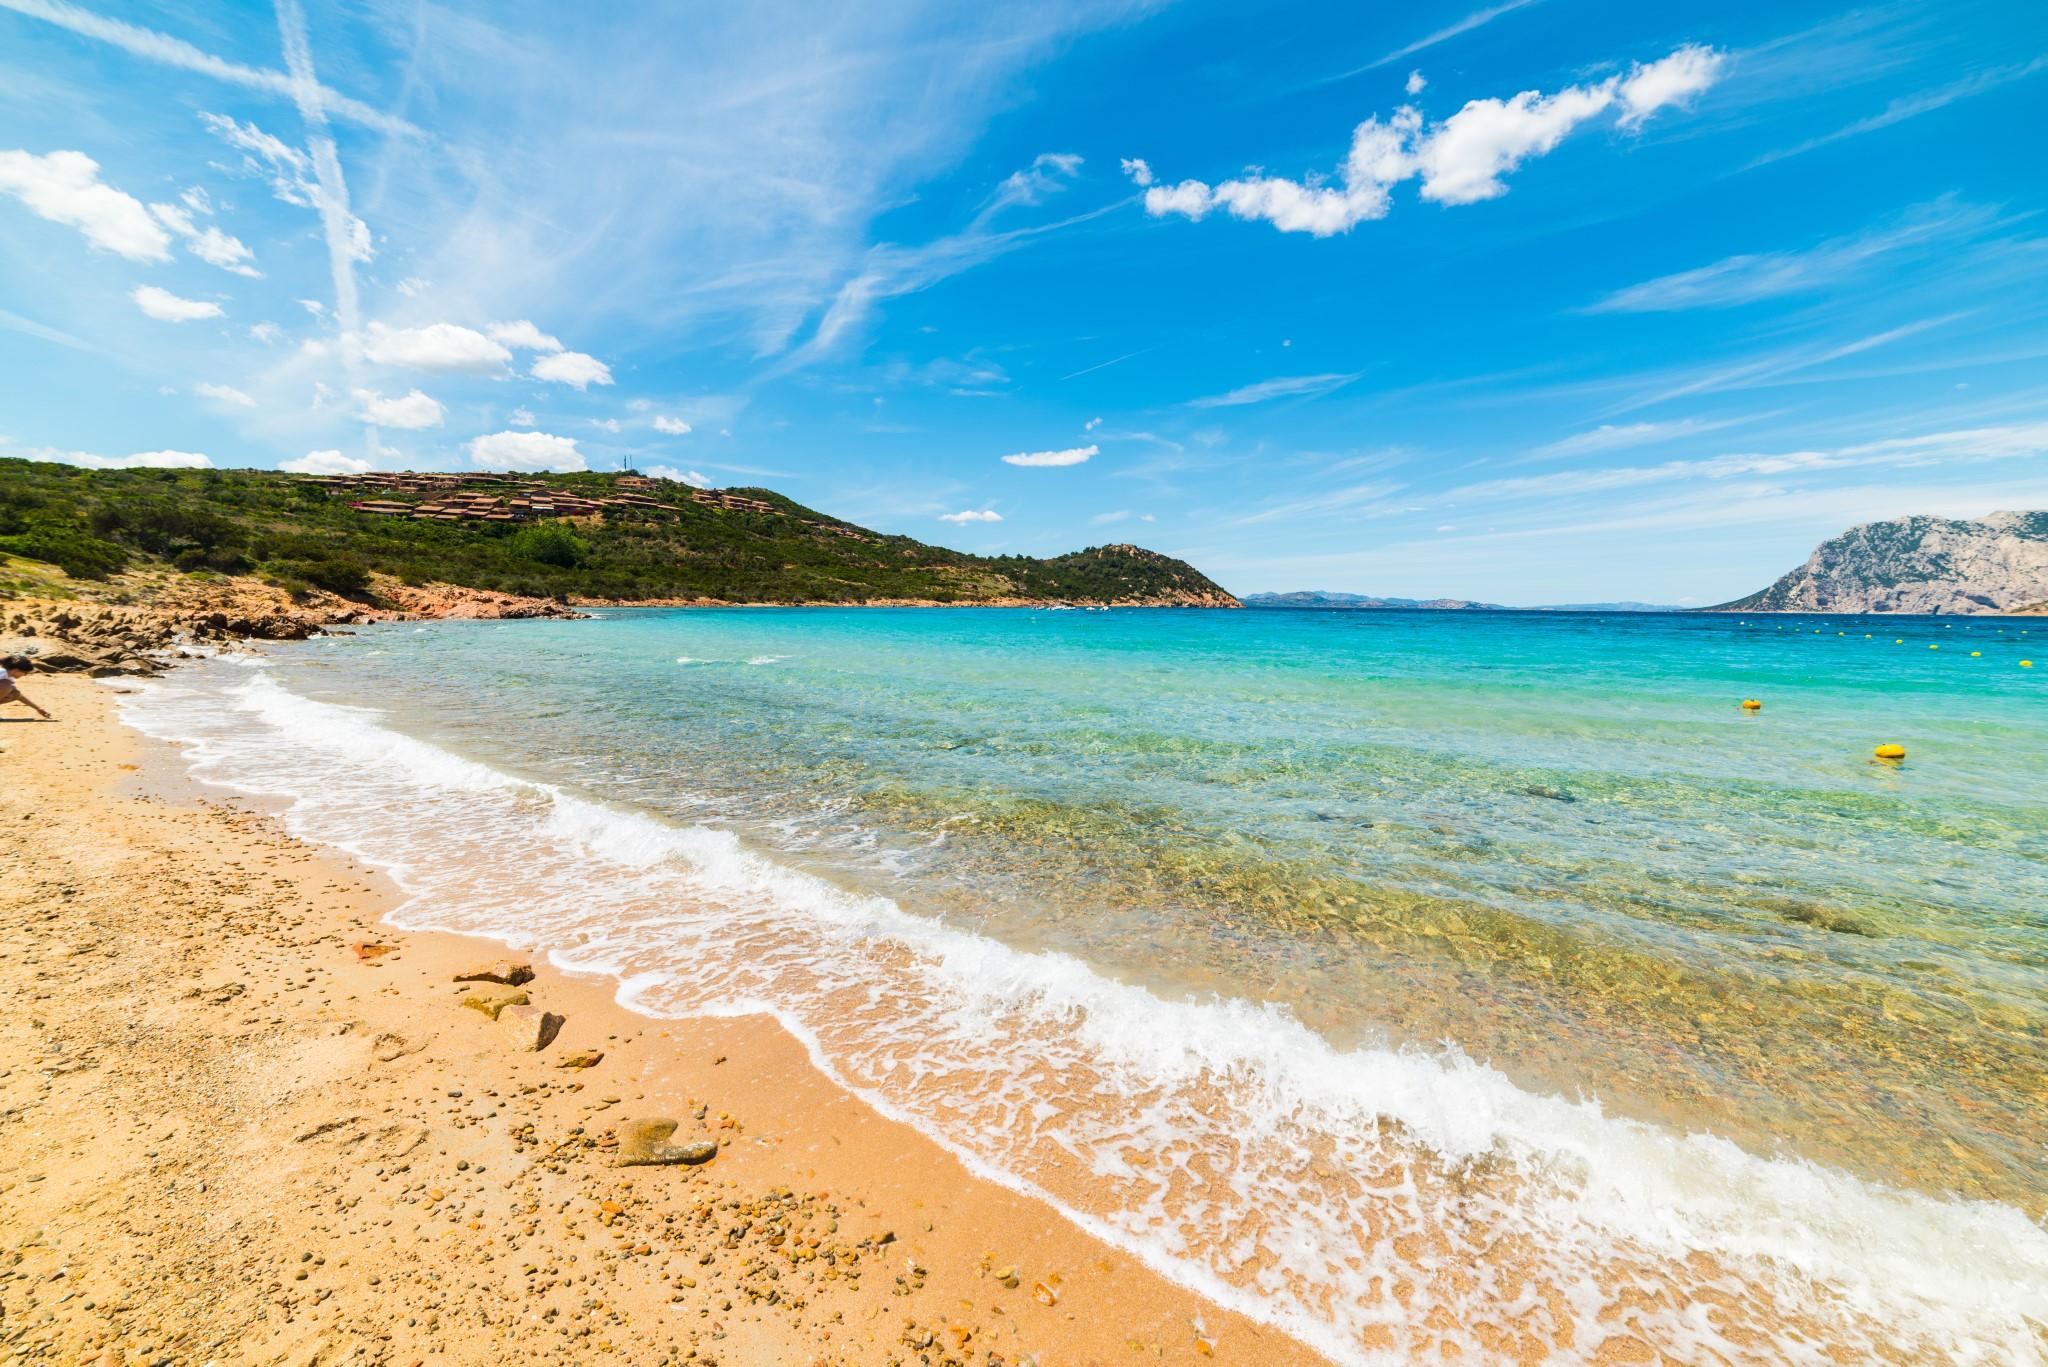 Capo Coda Cavallo shoreline on a clear day, Sardinia